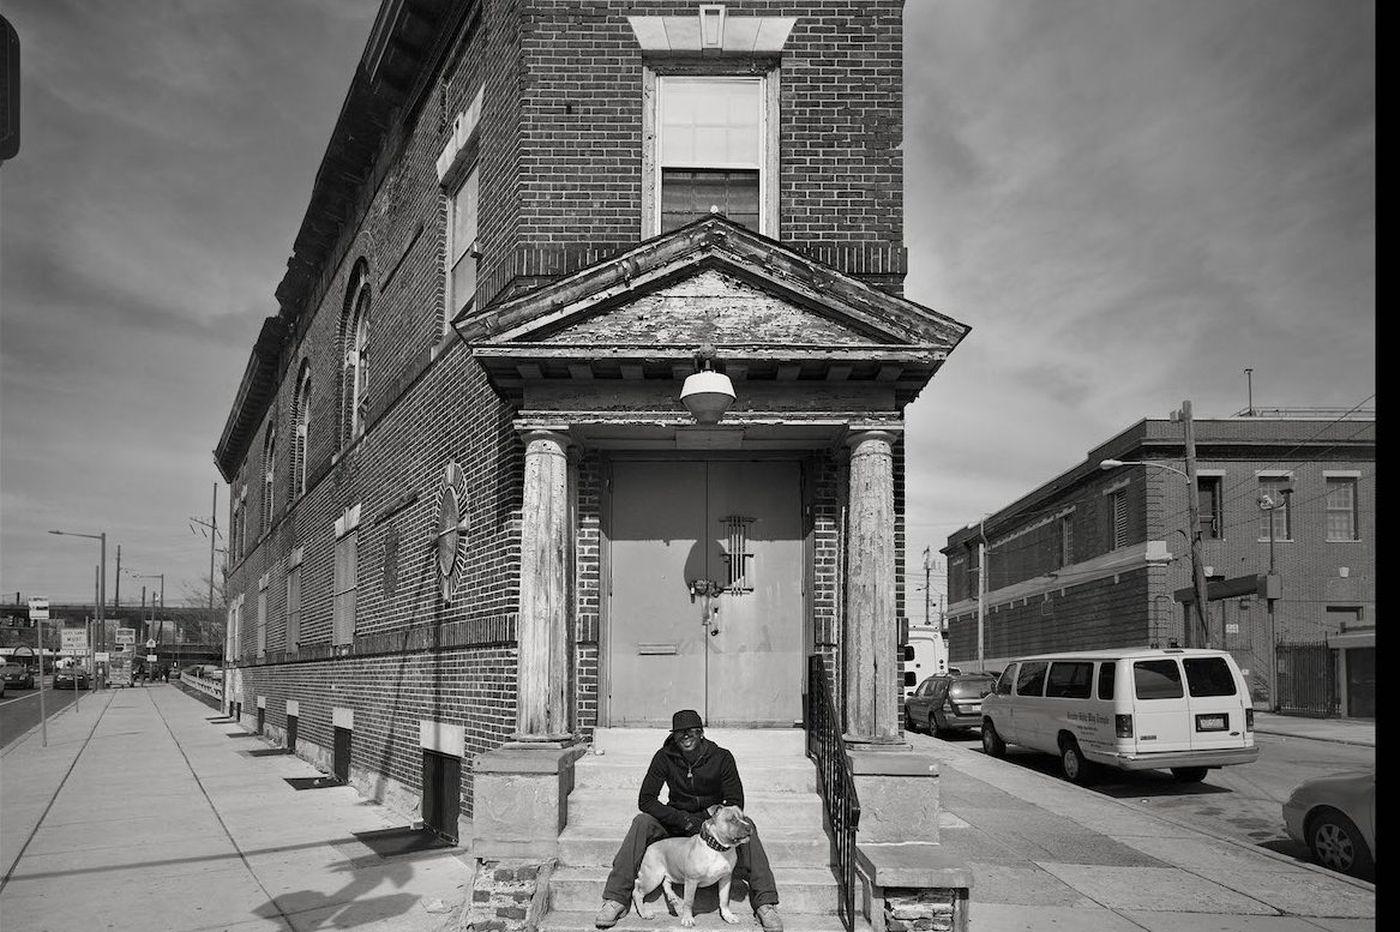 The history in pictures of West Philadelphia's forgotten 'Flatiron building' | Inga Saffron